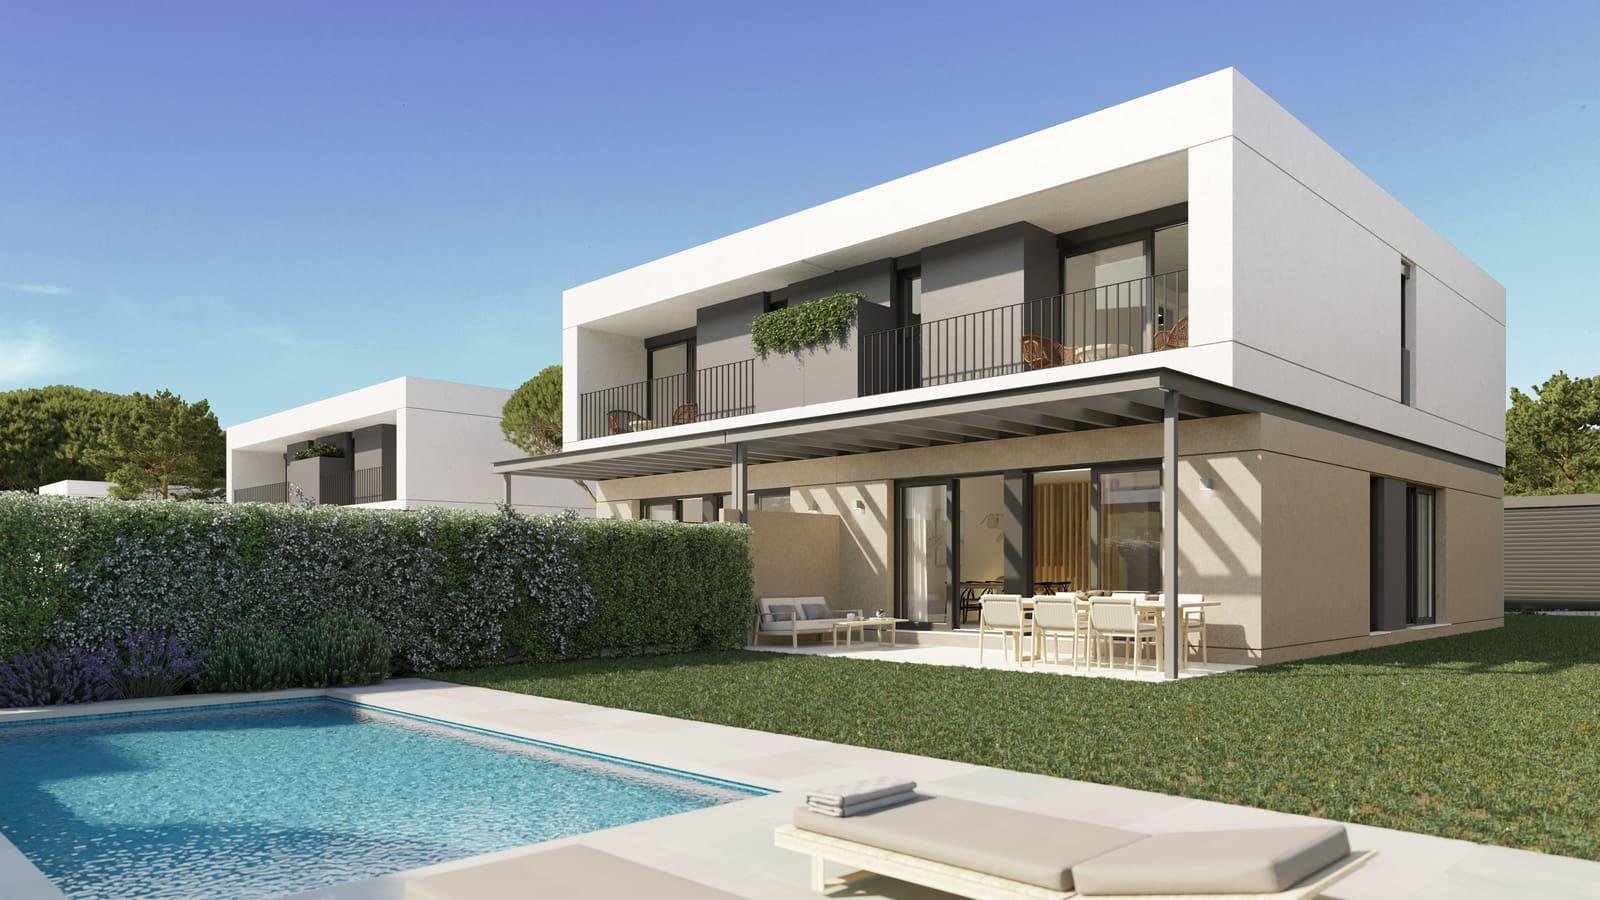 4 bedroom Semi-detached Villa for sale in Llucmajor - € 625,000 (Ref: 5931393)